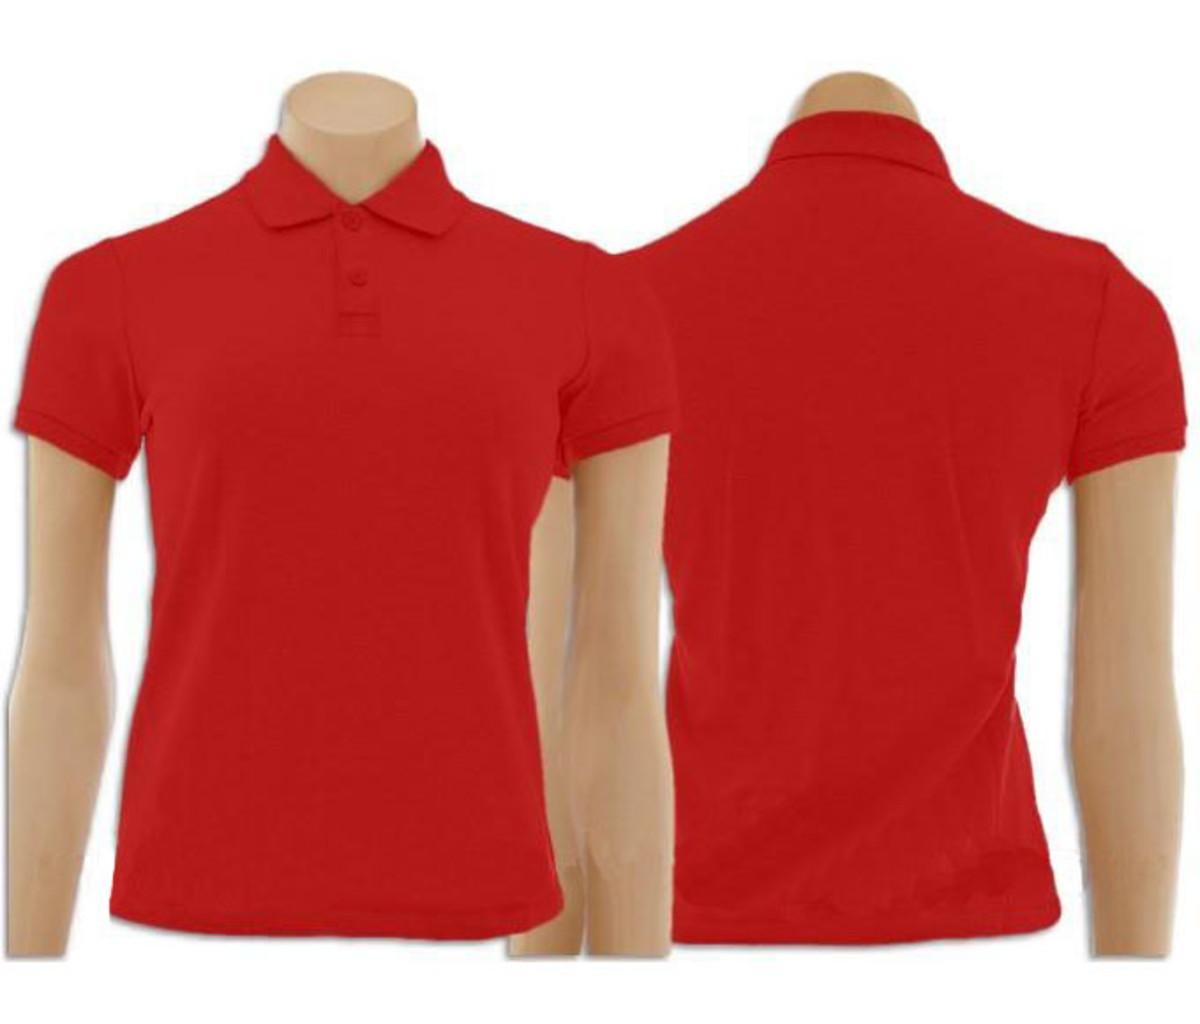 0fee60d4bc57f Camiseta Gola Polo Vermelho Feminino no Elo7